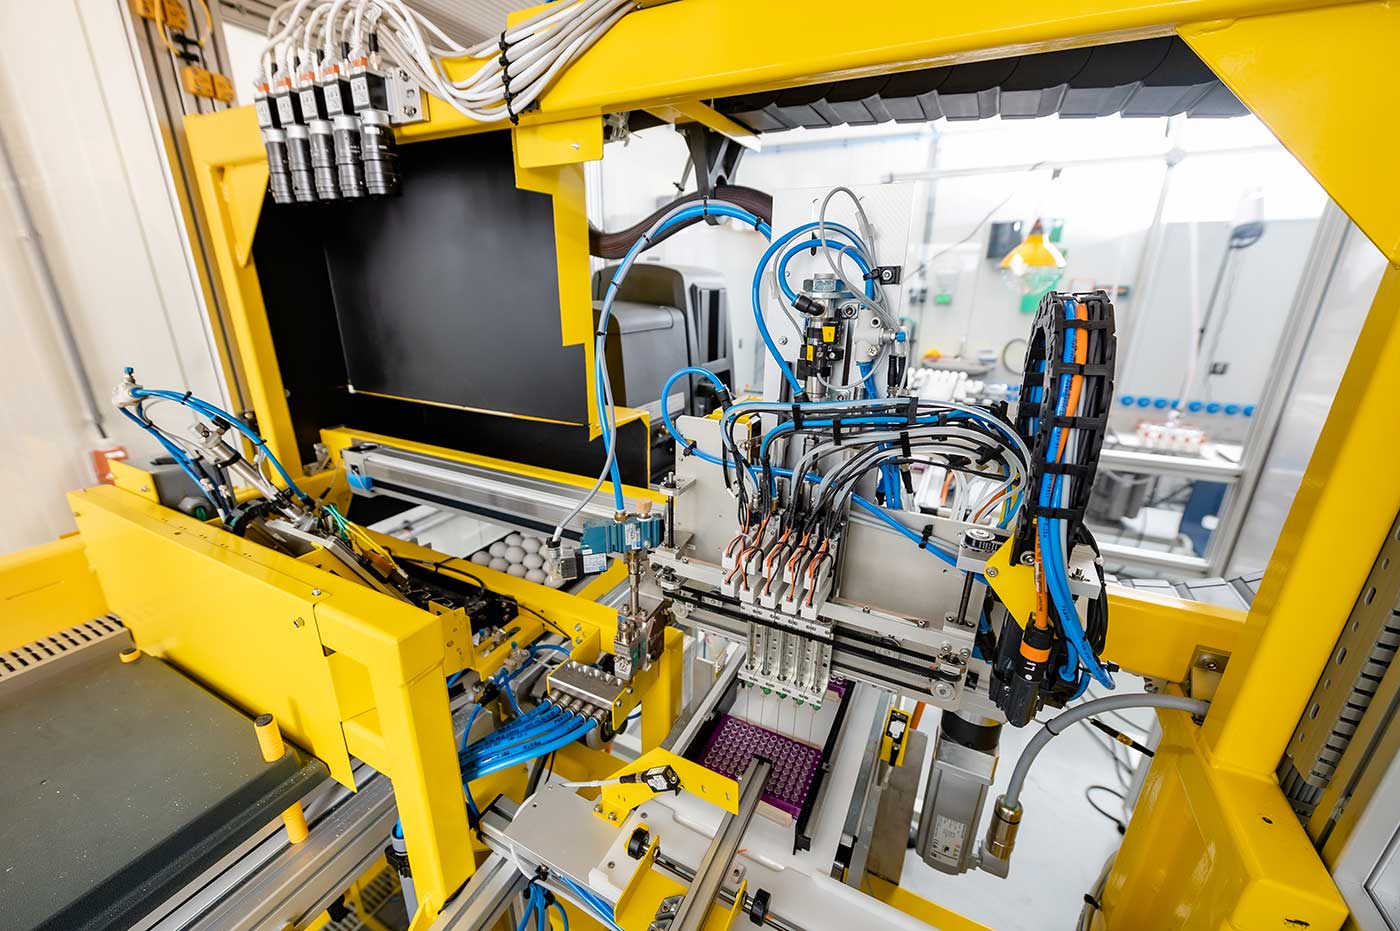 In Ovo machine sampling system